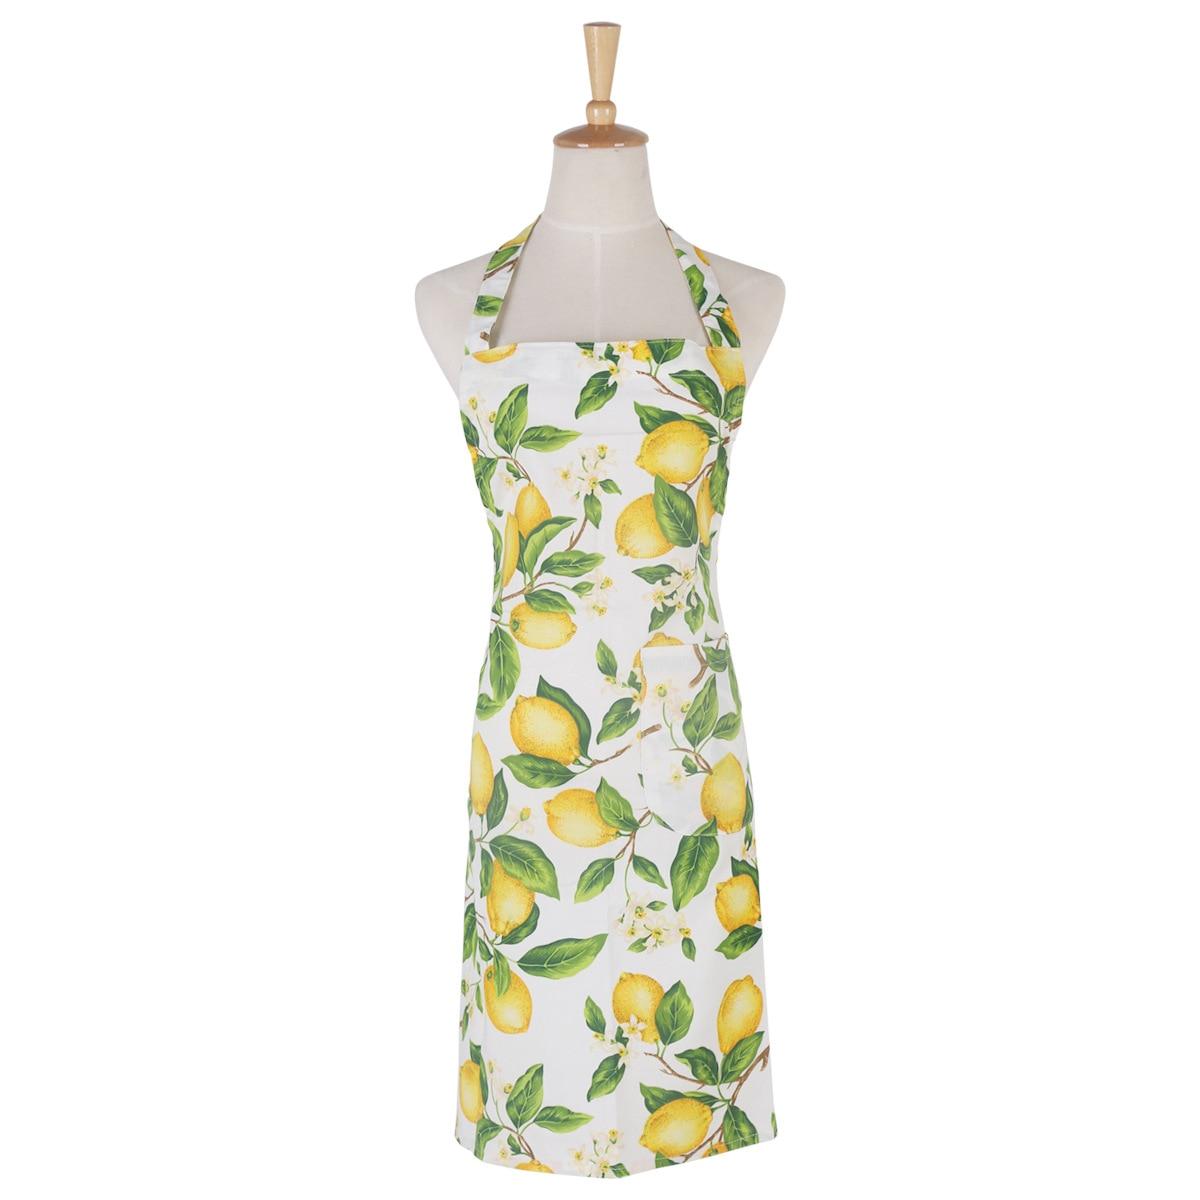 Buy white apron nz - Women Yellow Lemons Cotton Apron Vintage Kitchen Cooking Cuisine Pinafore Retro Pockets Apron China